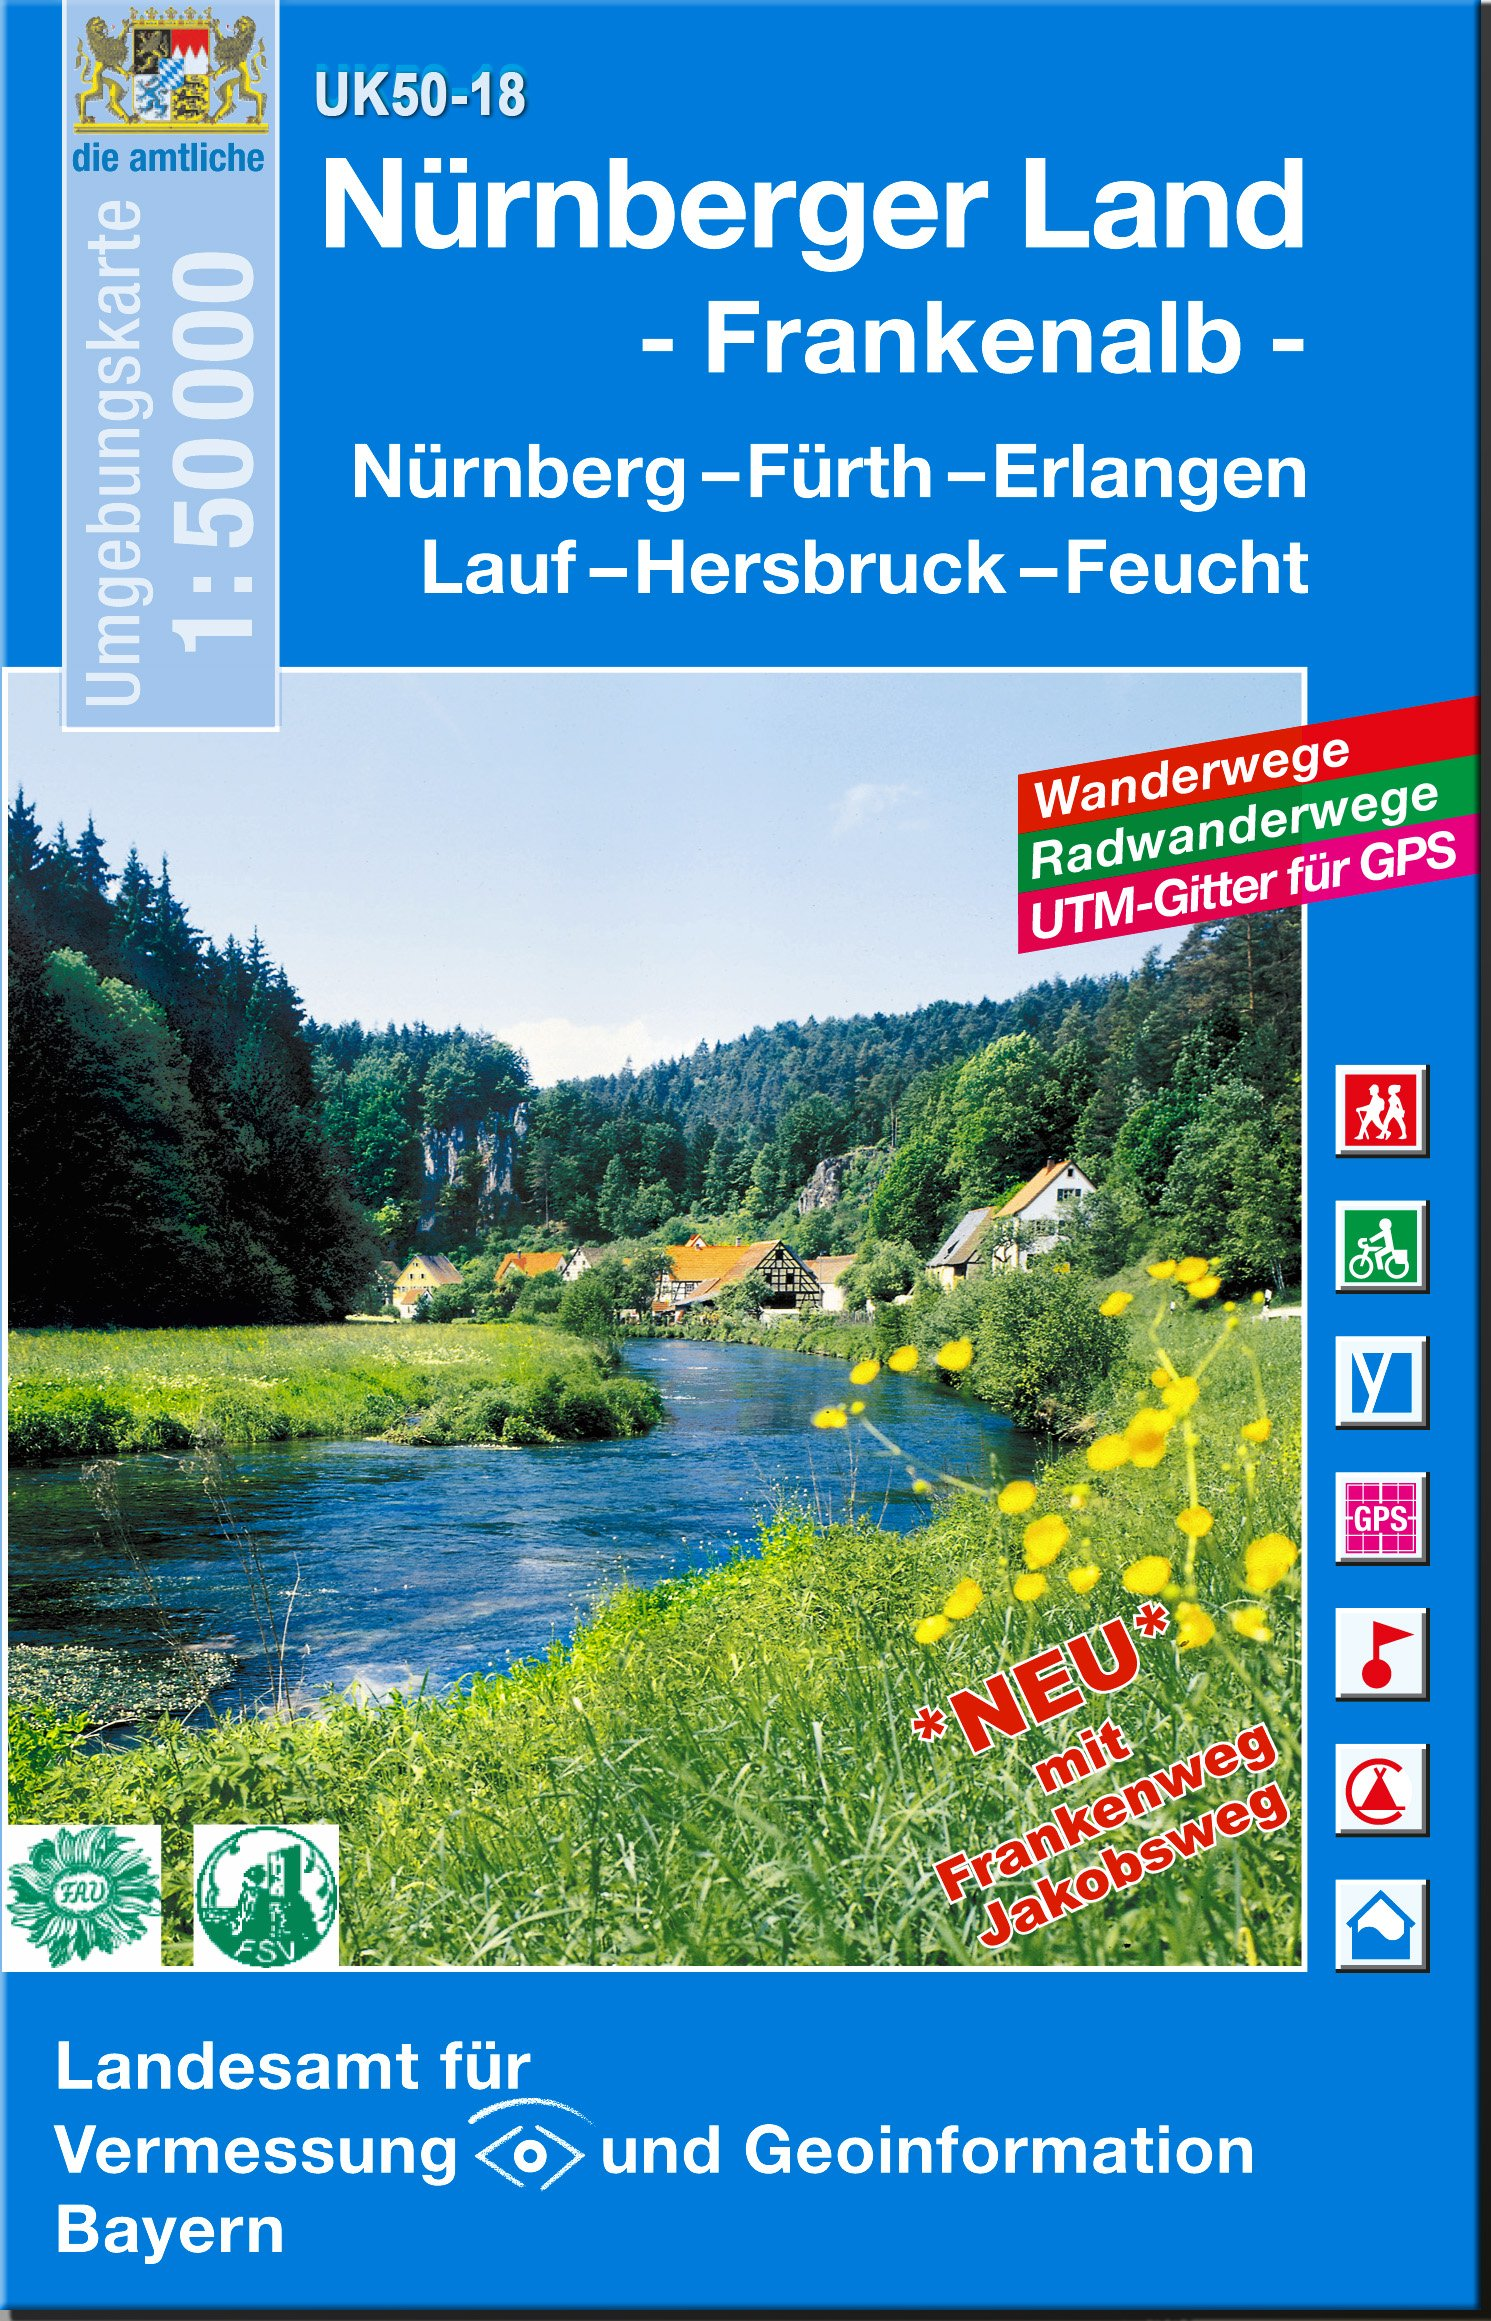 Nürnberger Land, Frankenalb 1 : 50 000: Nürnberg-Fürth-Erlangen-Lauf-Hersbruck-Feucht. Umgebungskarte. (UK 50-18) (UK50 Umgebungskarte 1:50000 Bayern Topographische Karte Freizeitkarte Wanderkarte)